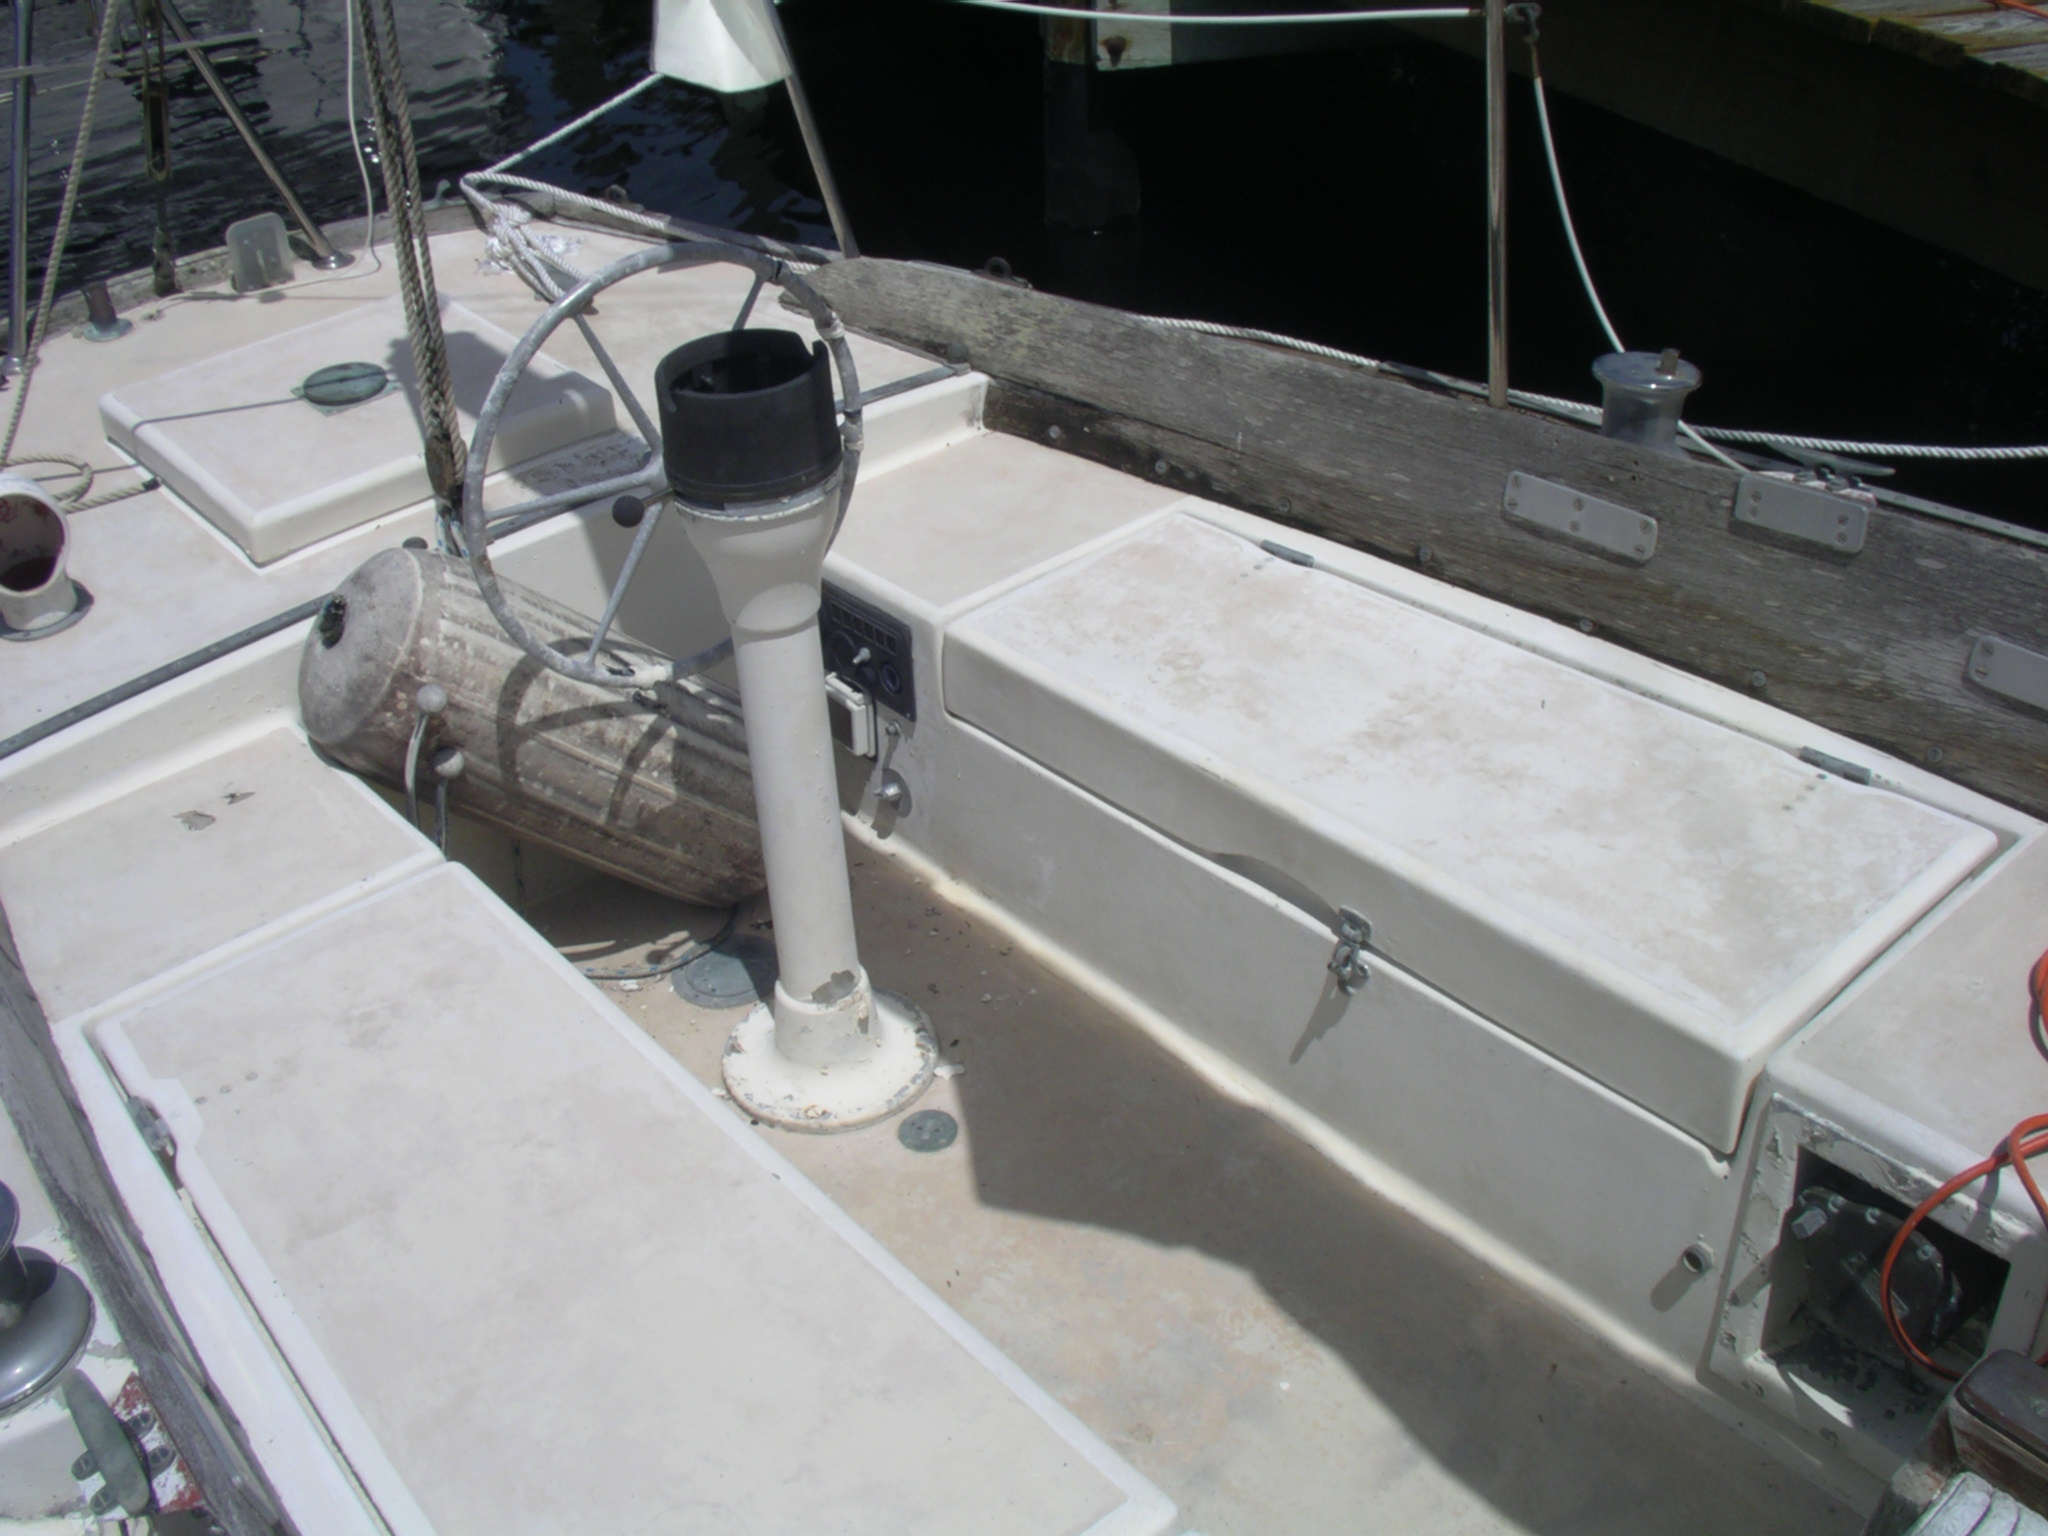 BoatDeck_July2010 (5).JPG